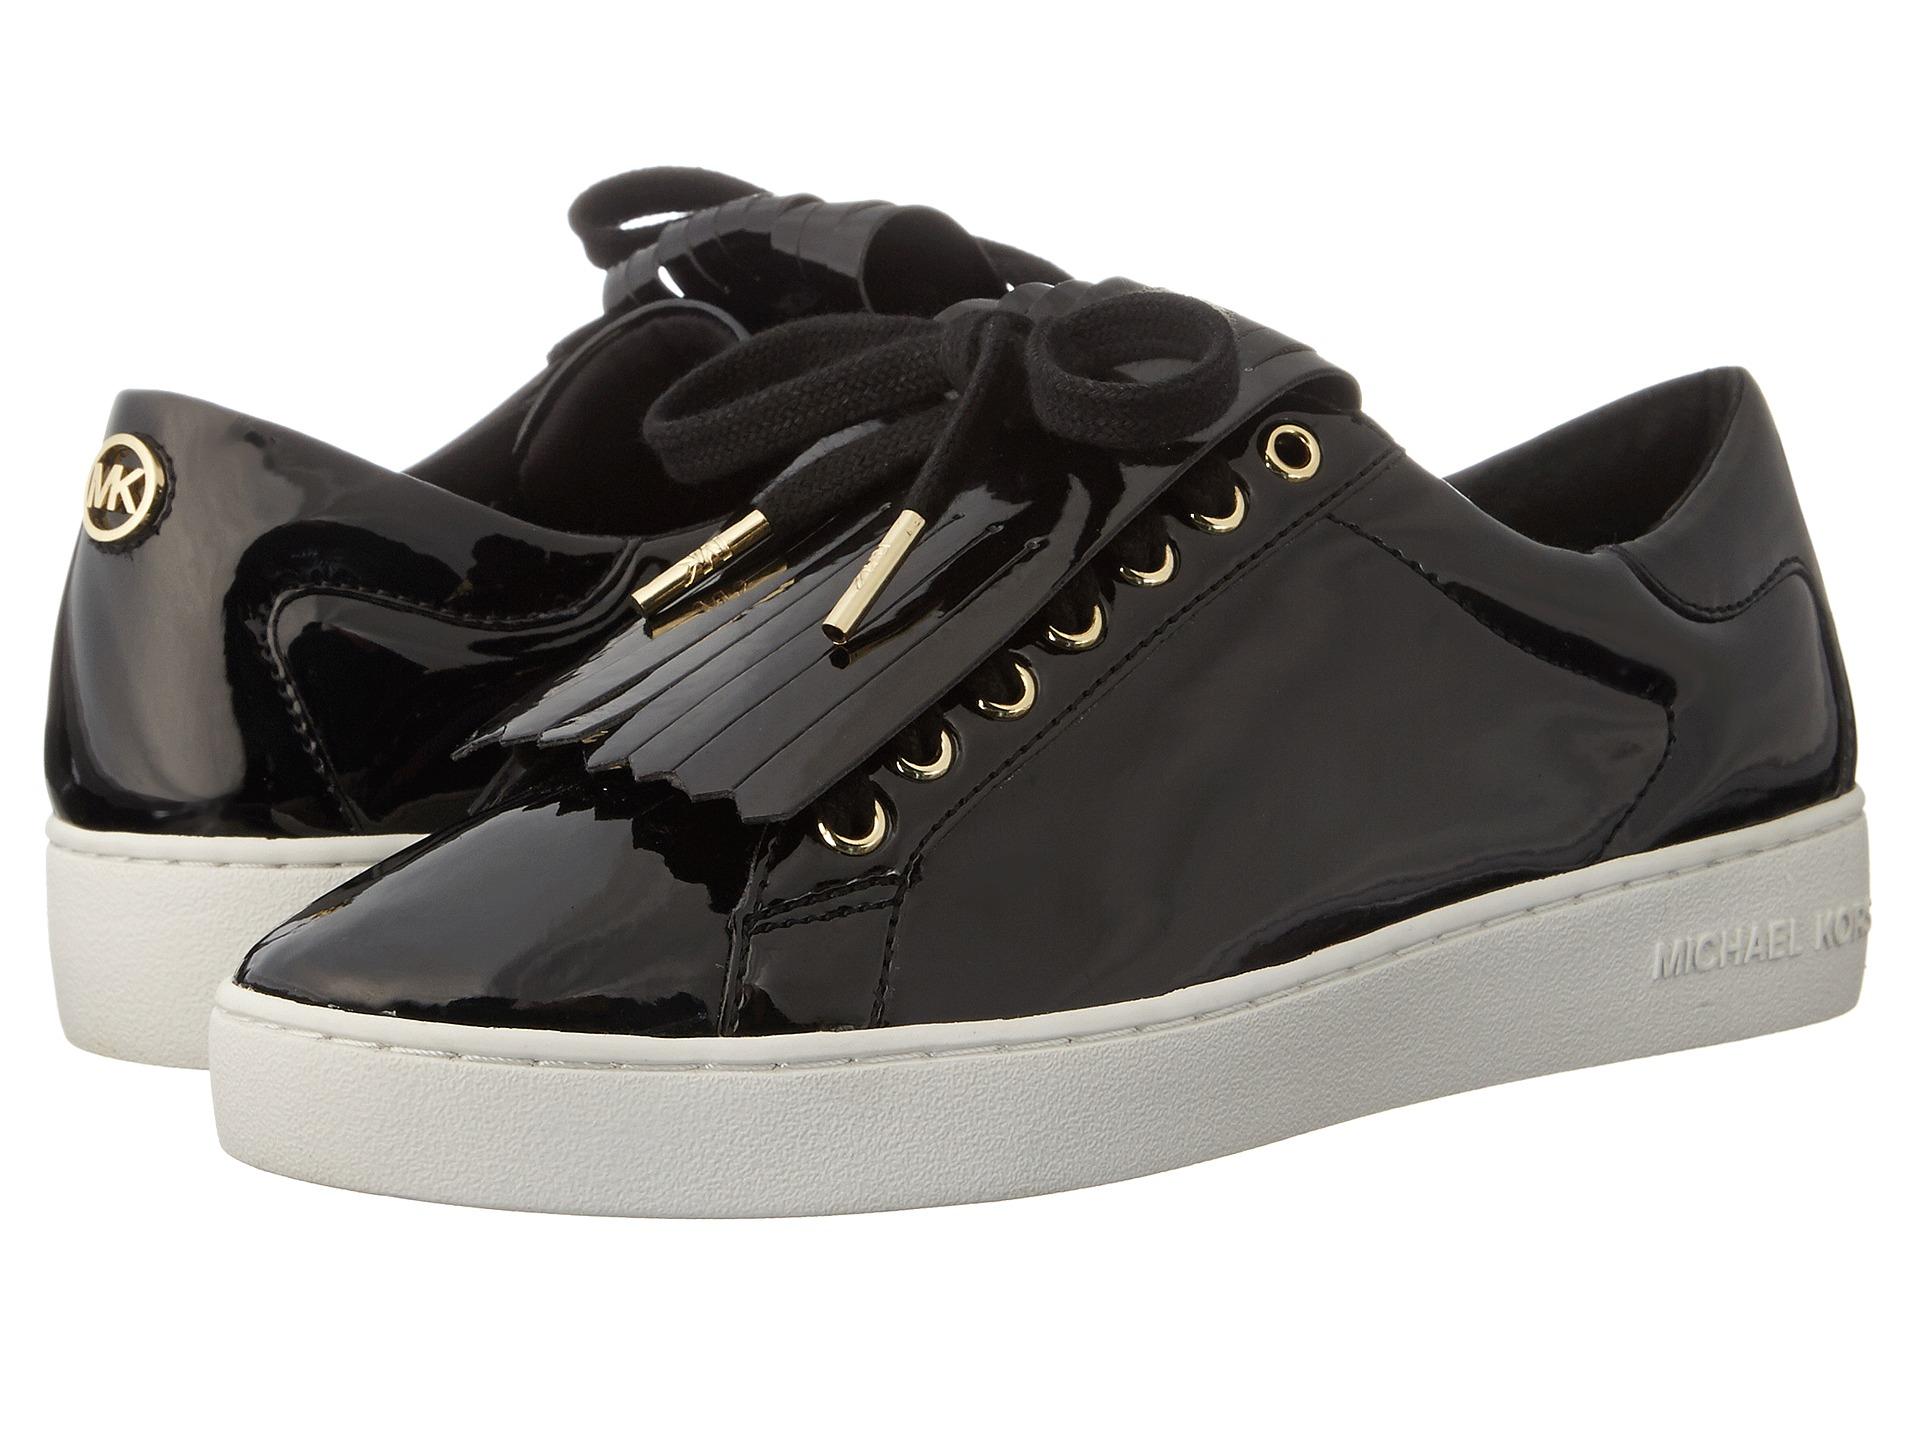 michael michael kors keaton kiltie sneaker in black lyst. Black Bedroom Furniture Sets. Home Design Ideas